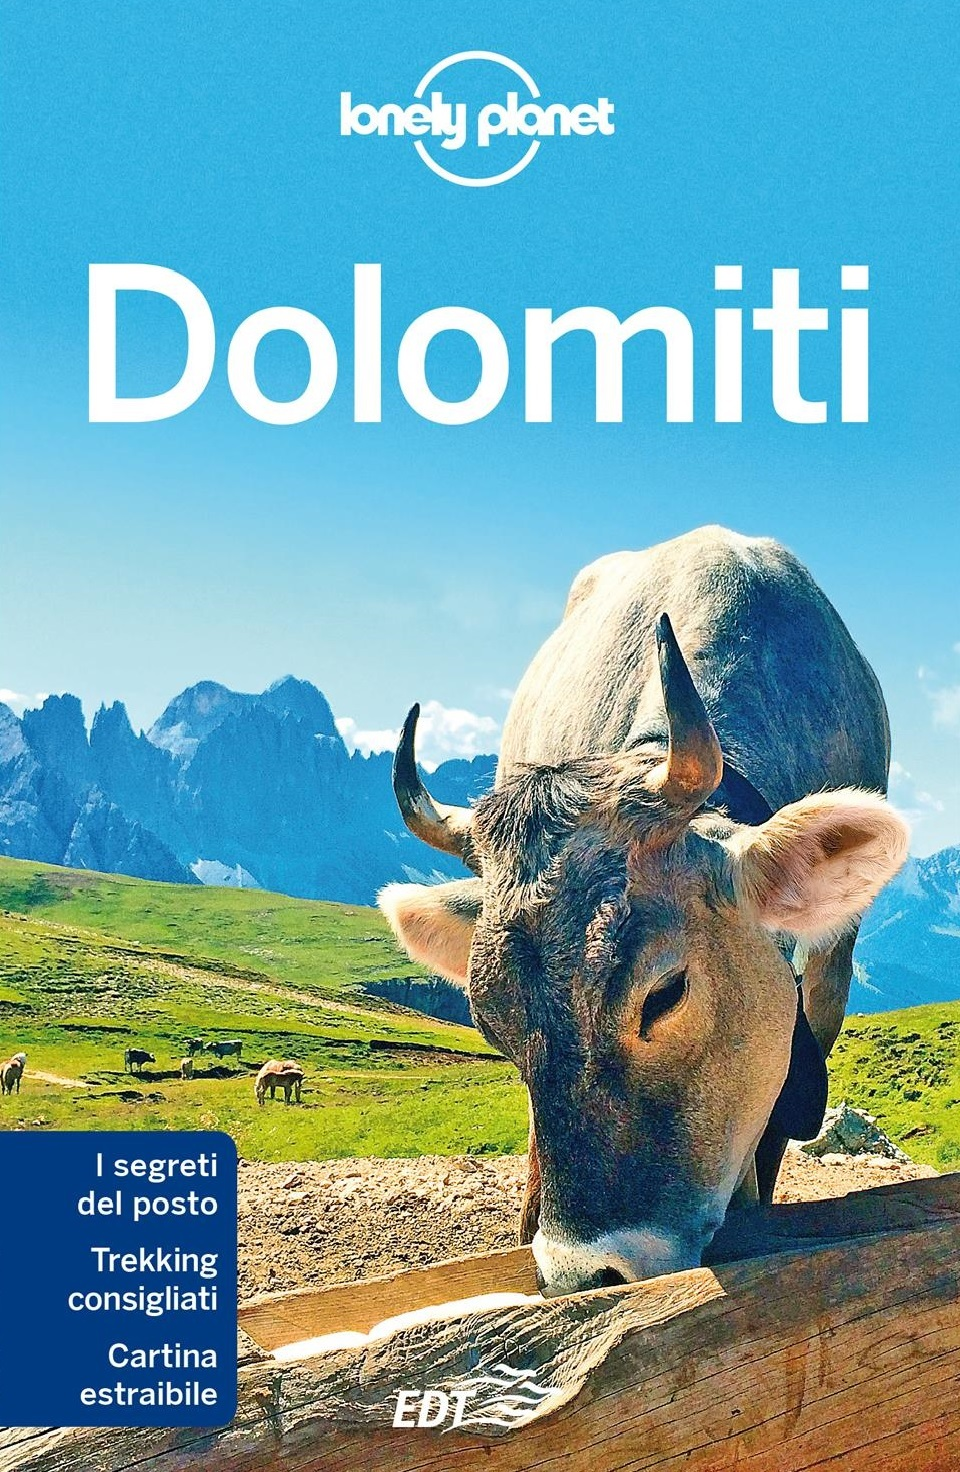 lonley-planet-dolomiti